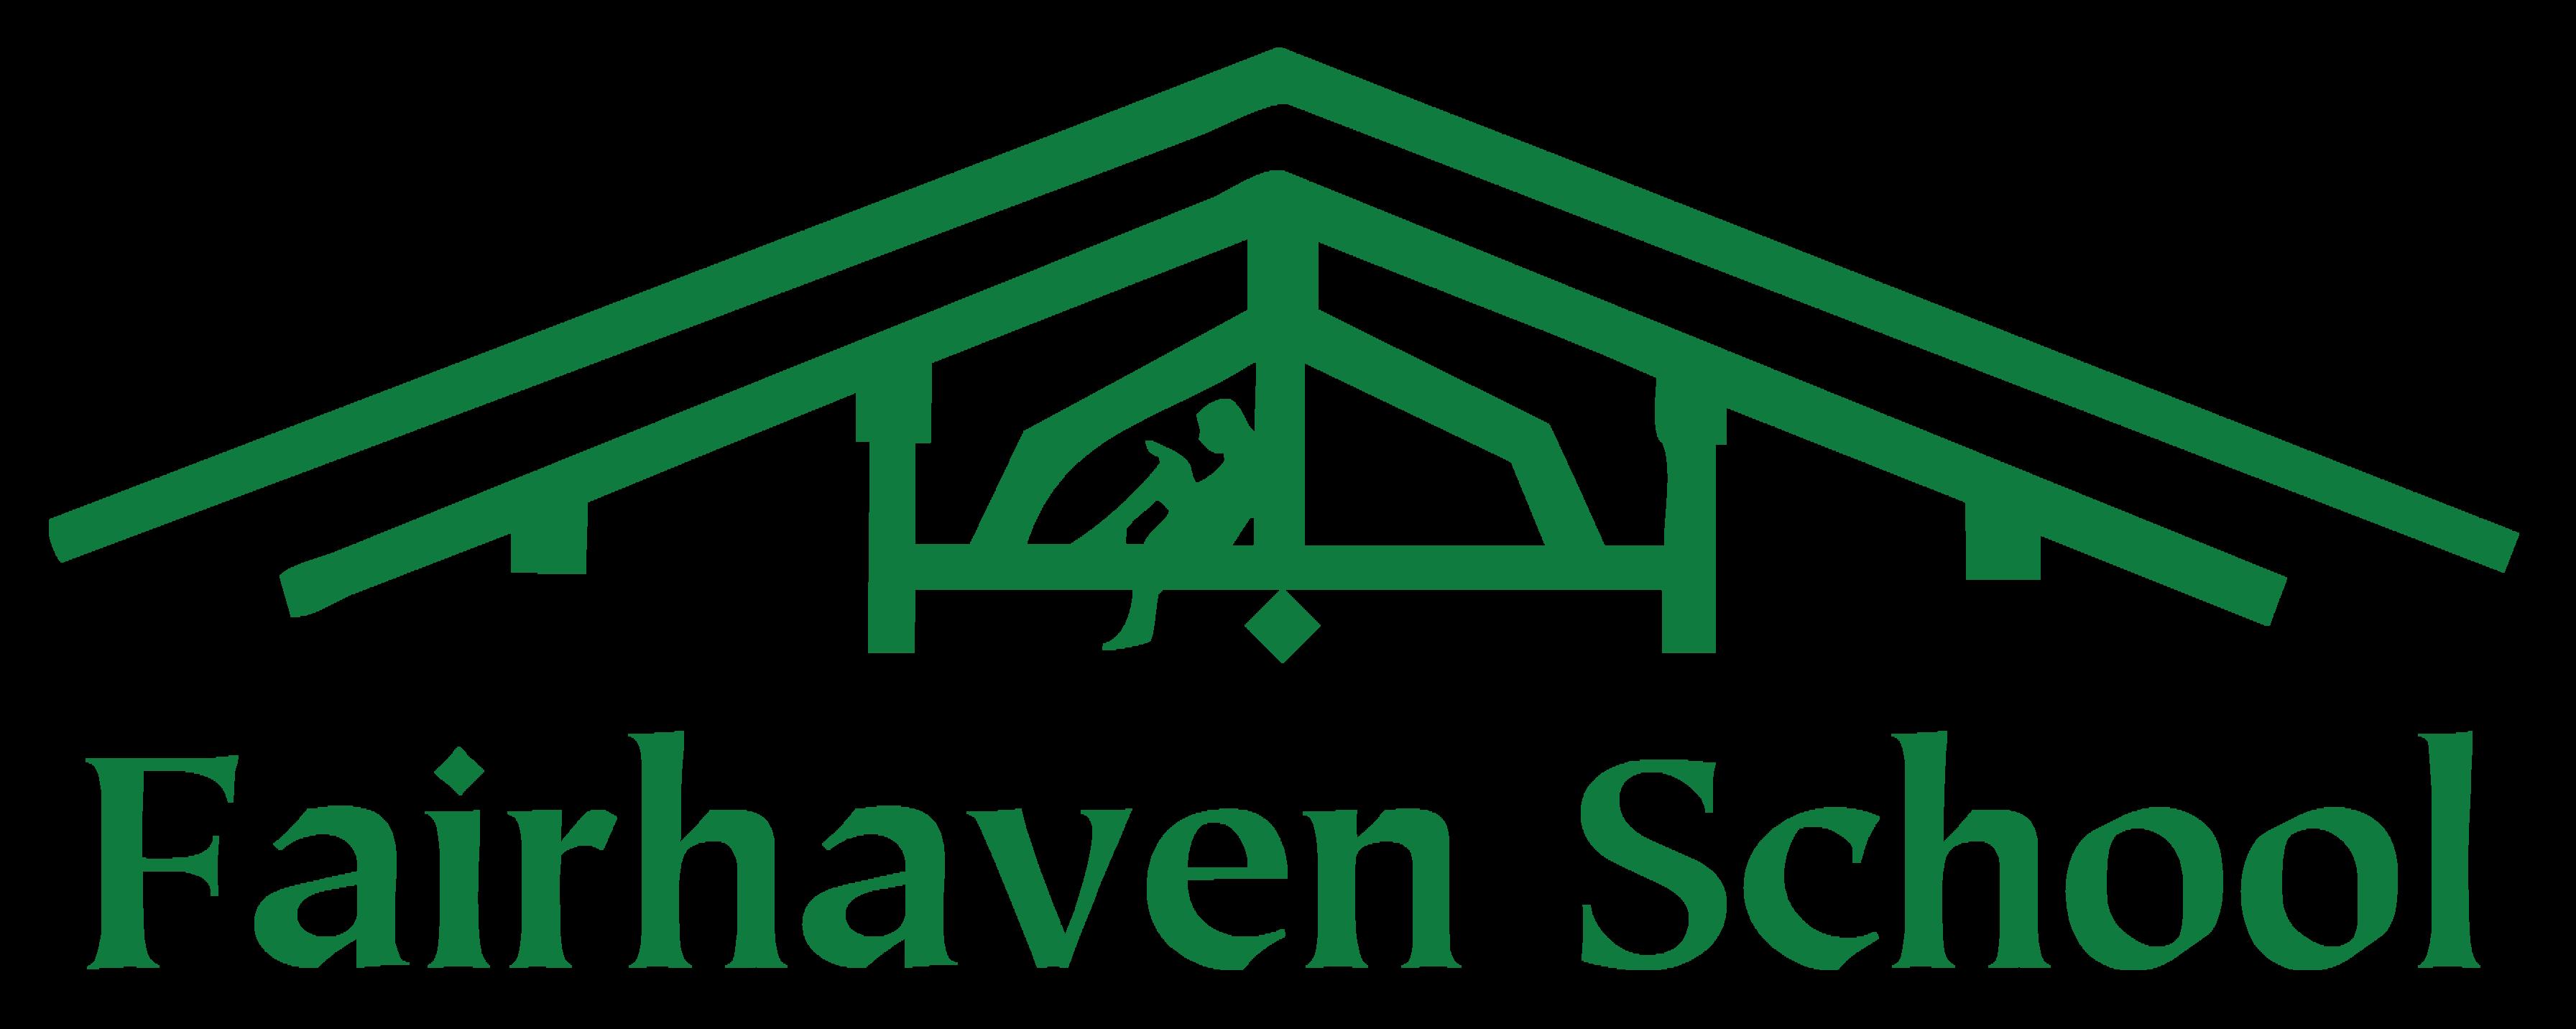 Fairhaven School logo